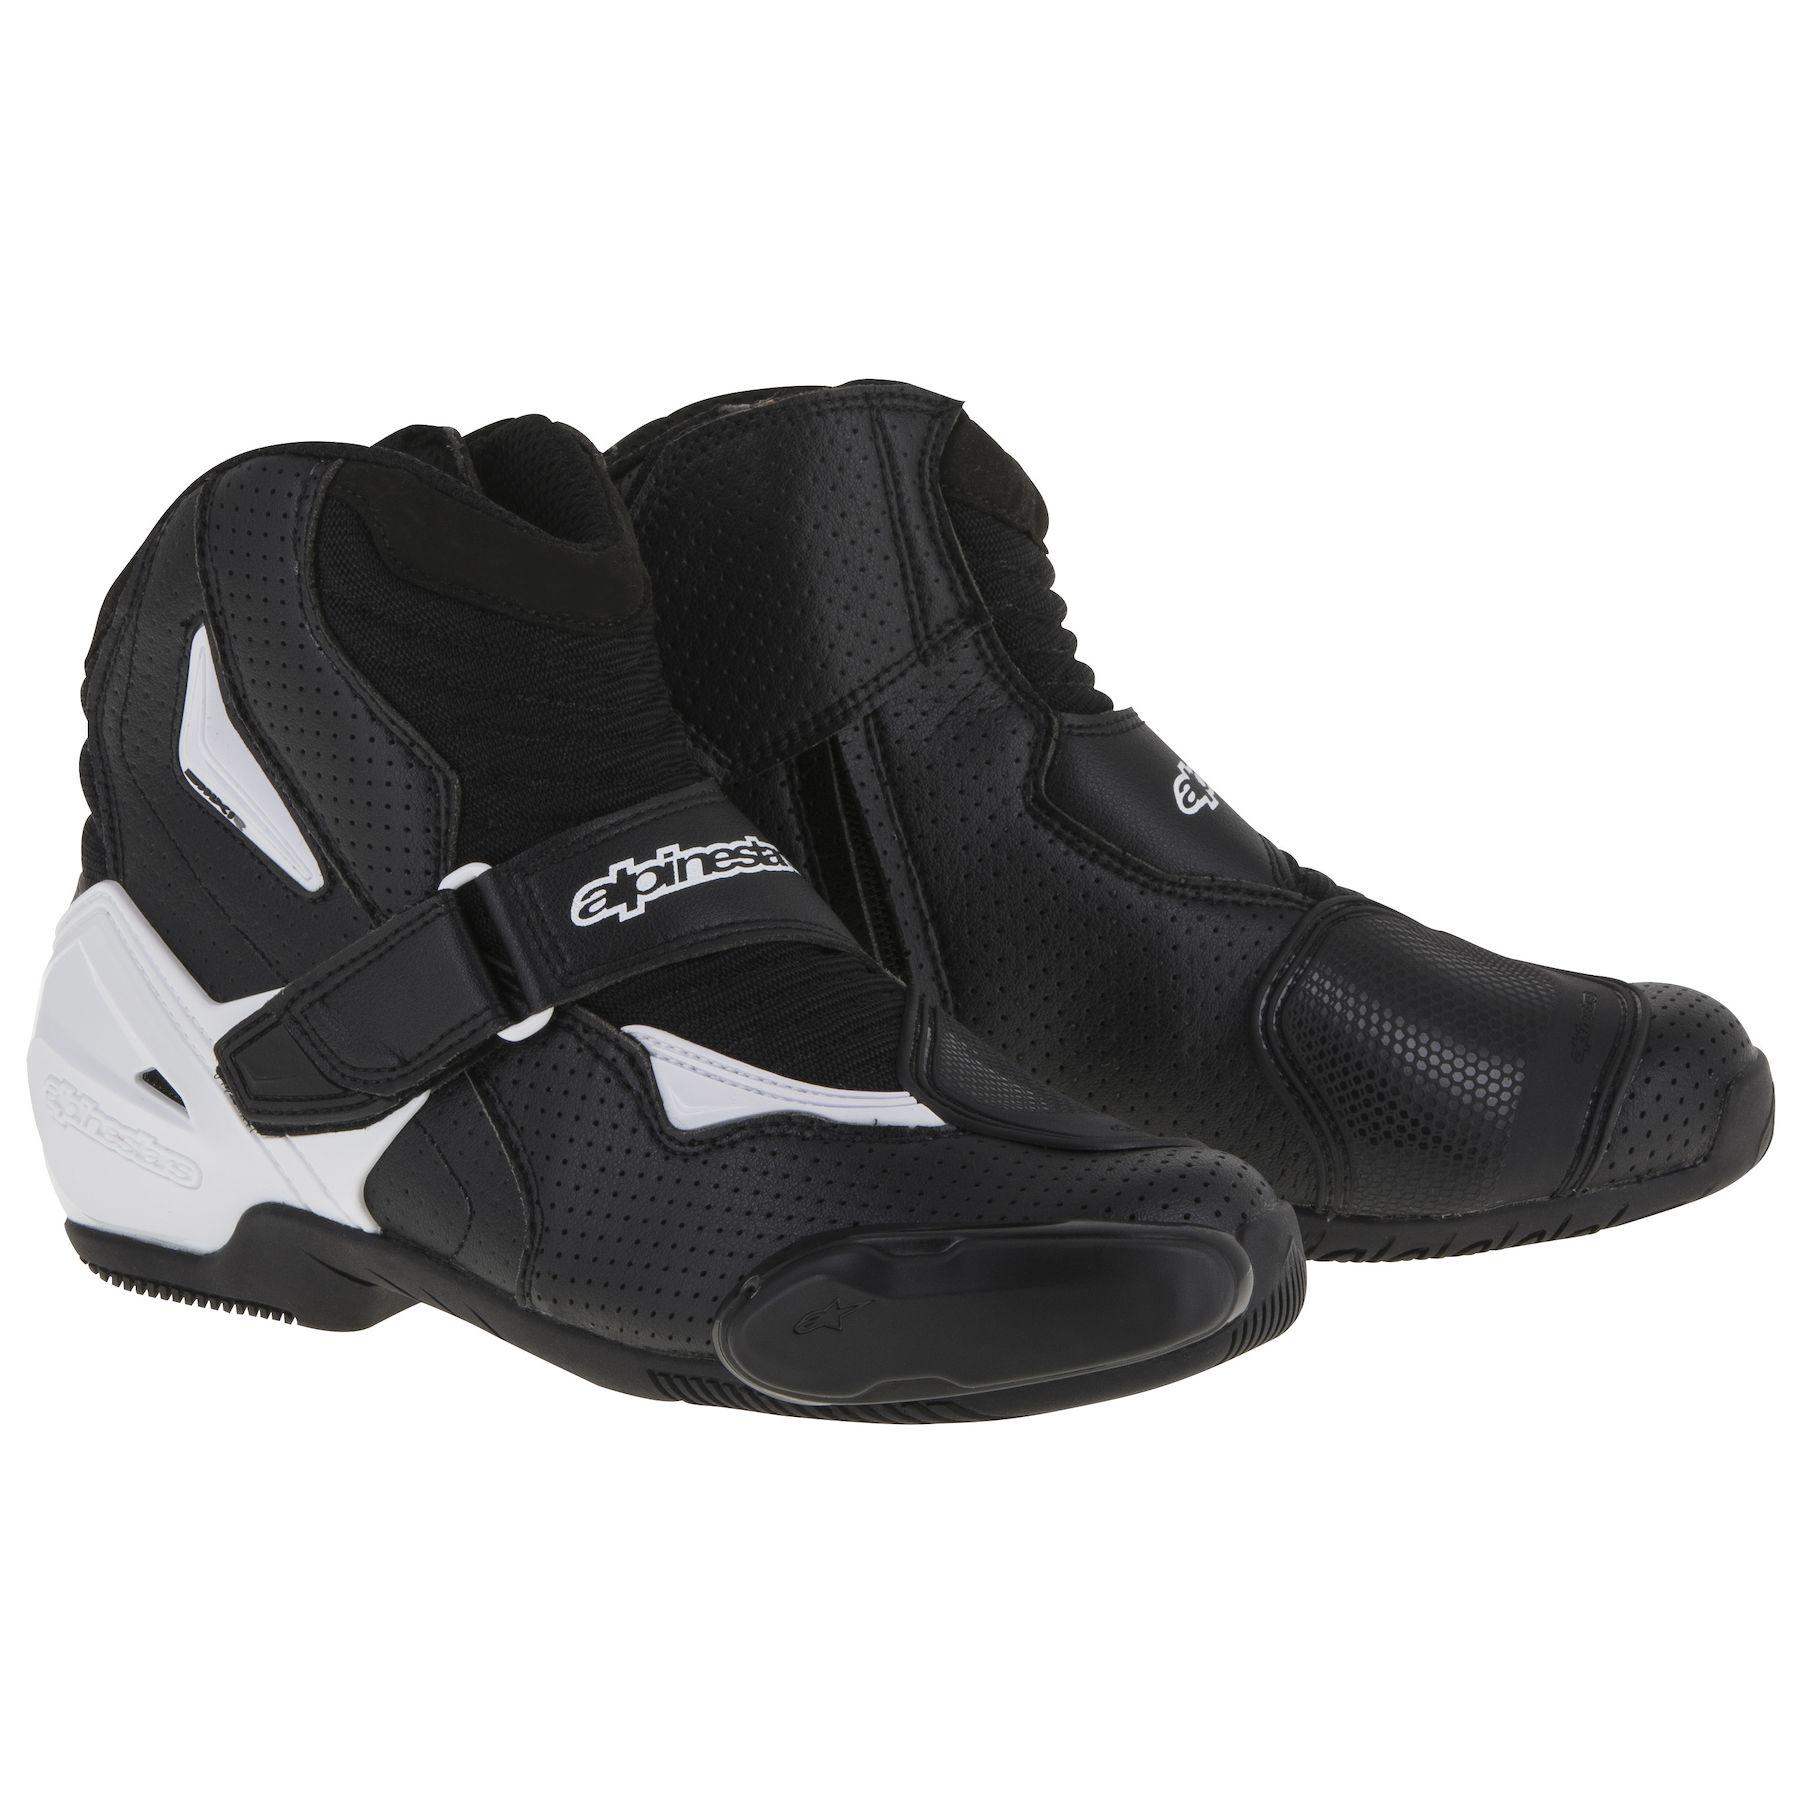 Topánky SMX-1 R, ALPINESTARS (biele/čierne)